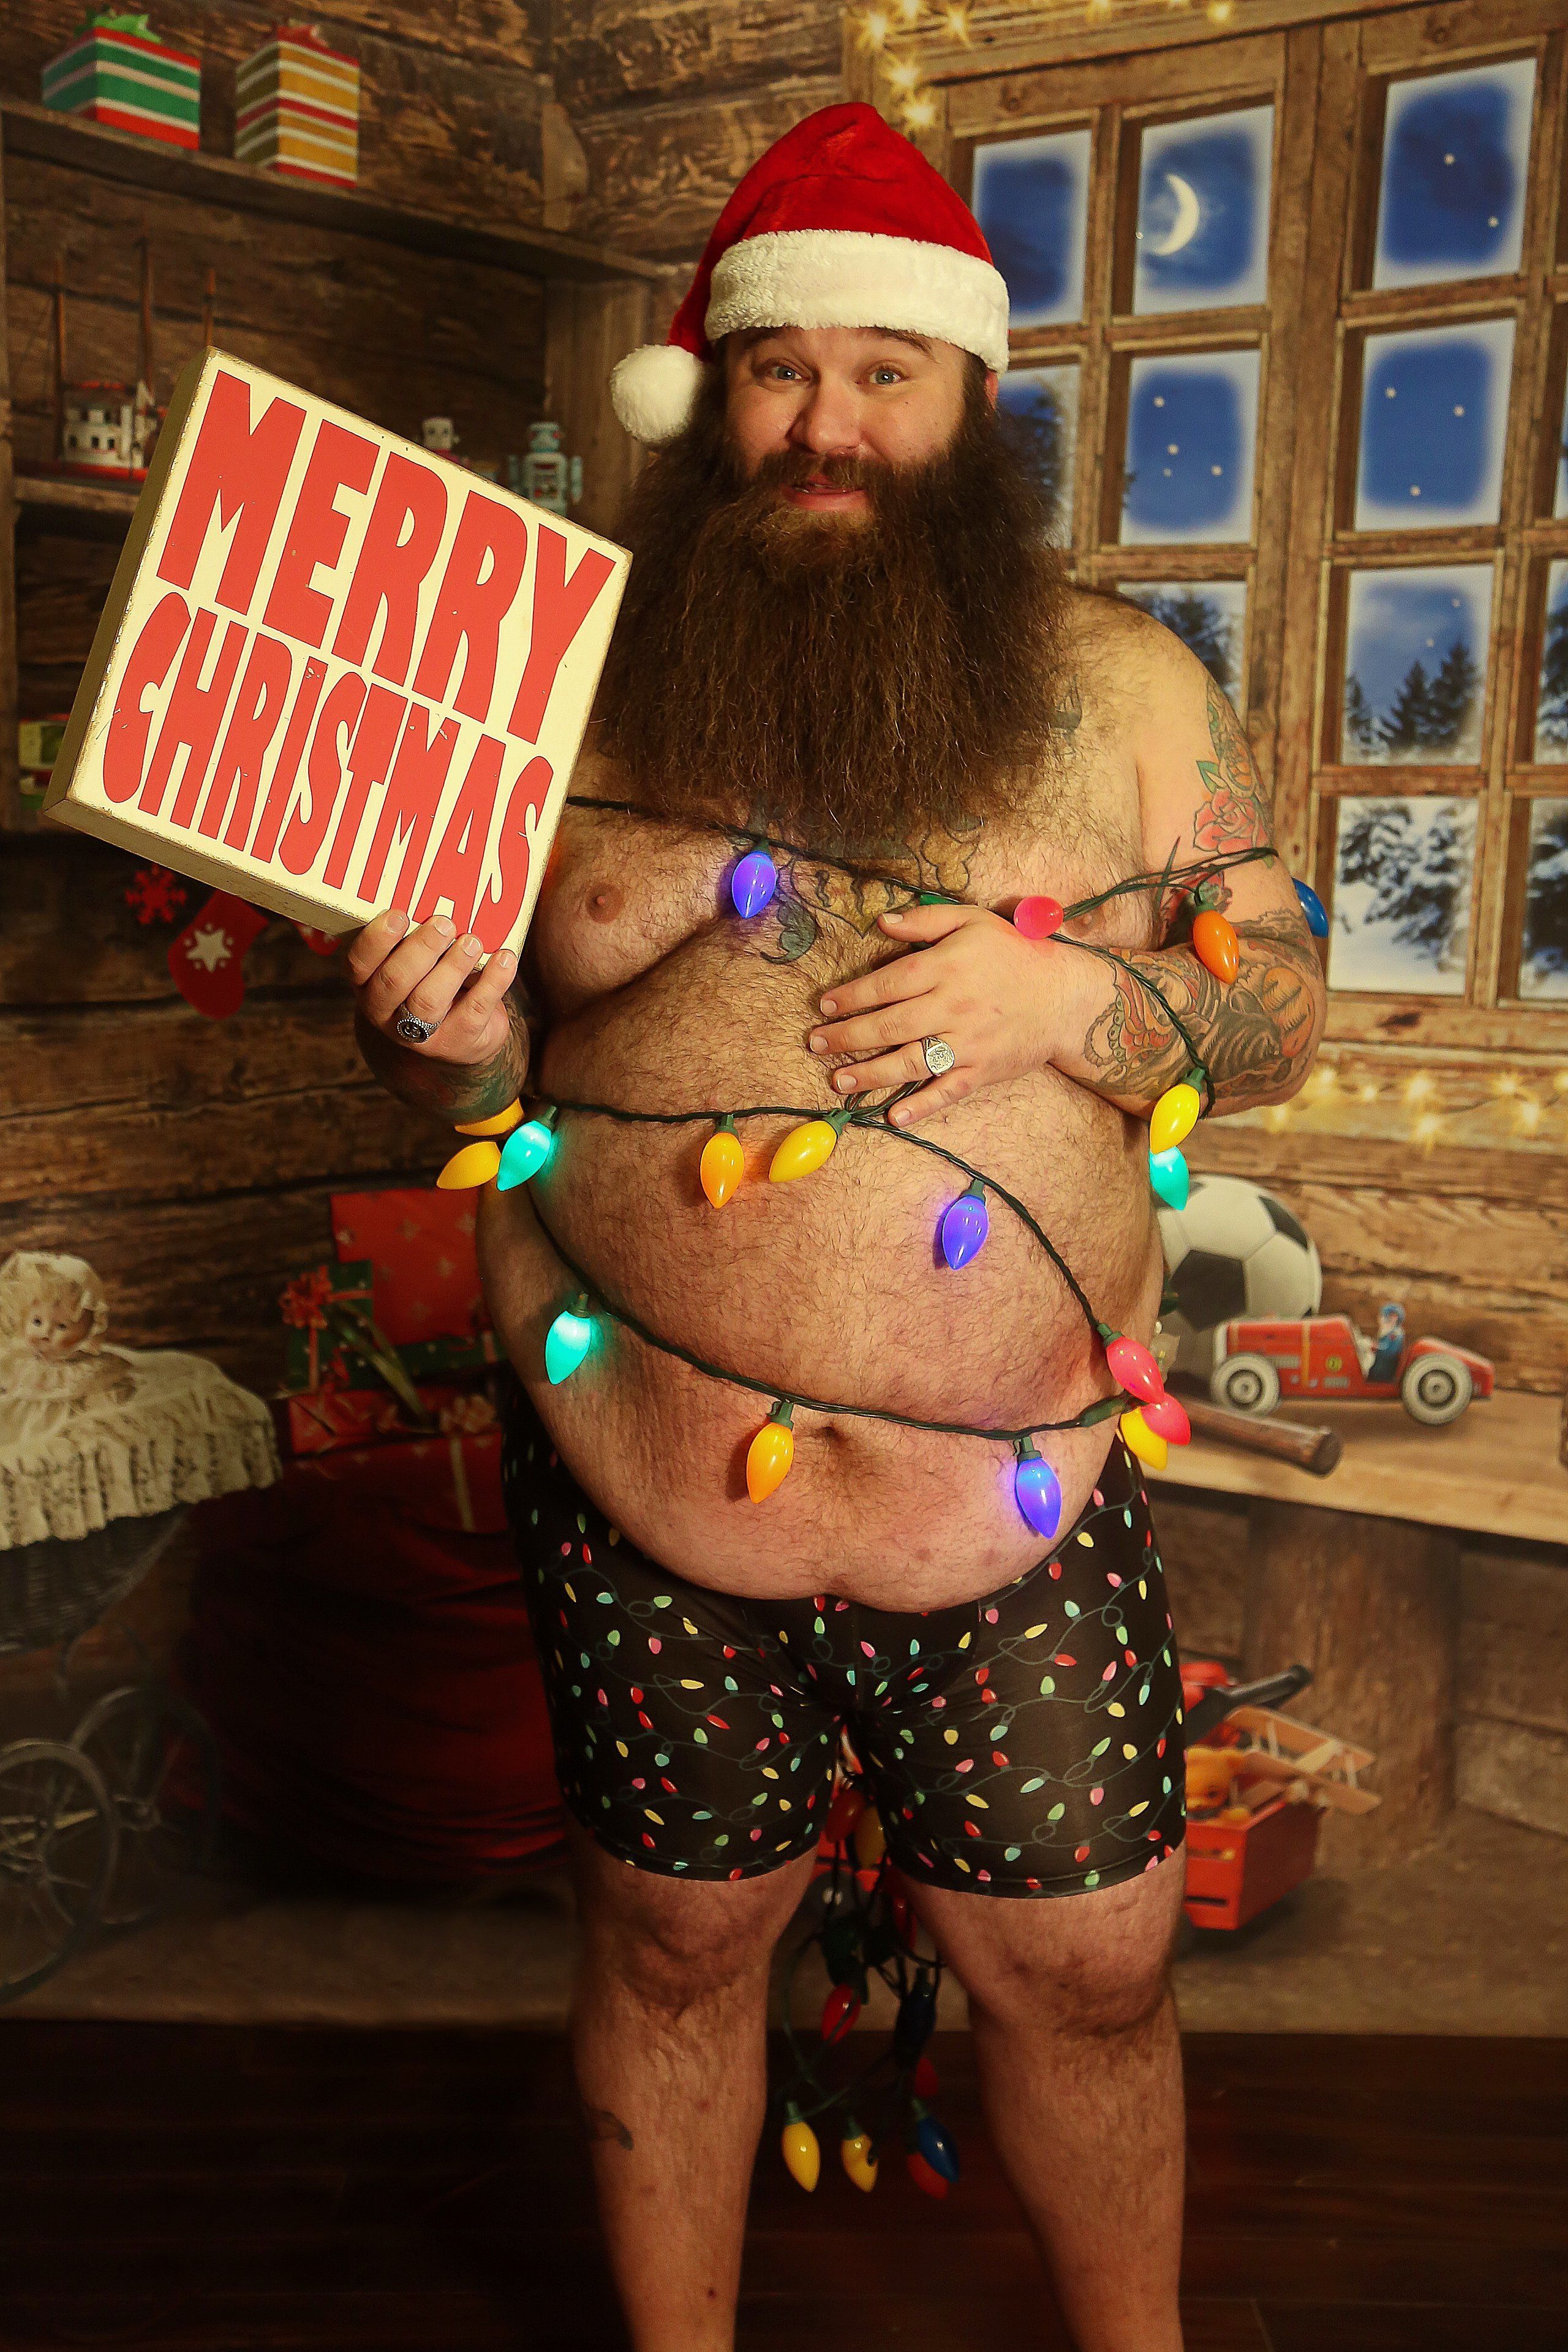 Merry Christmas right back atchya, big man.